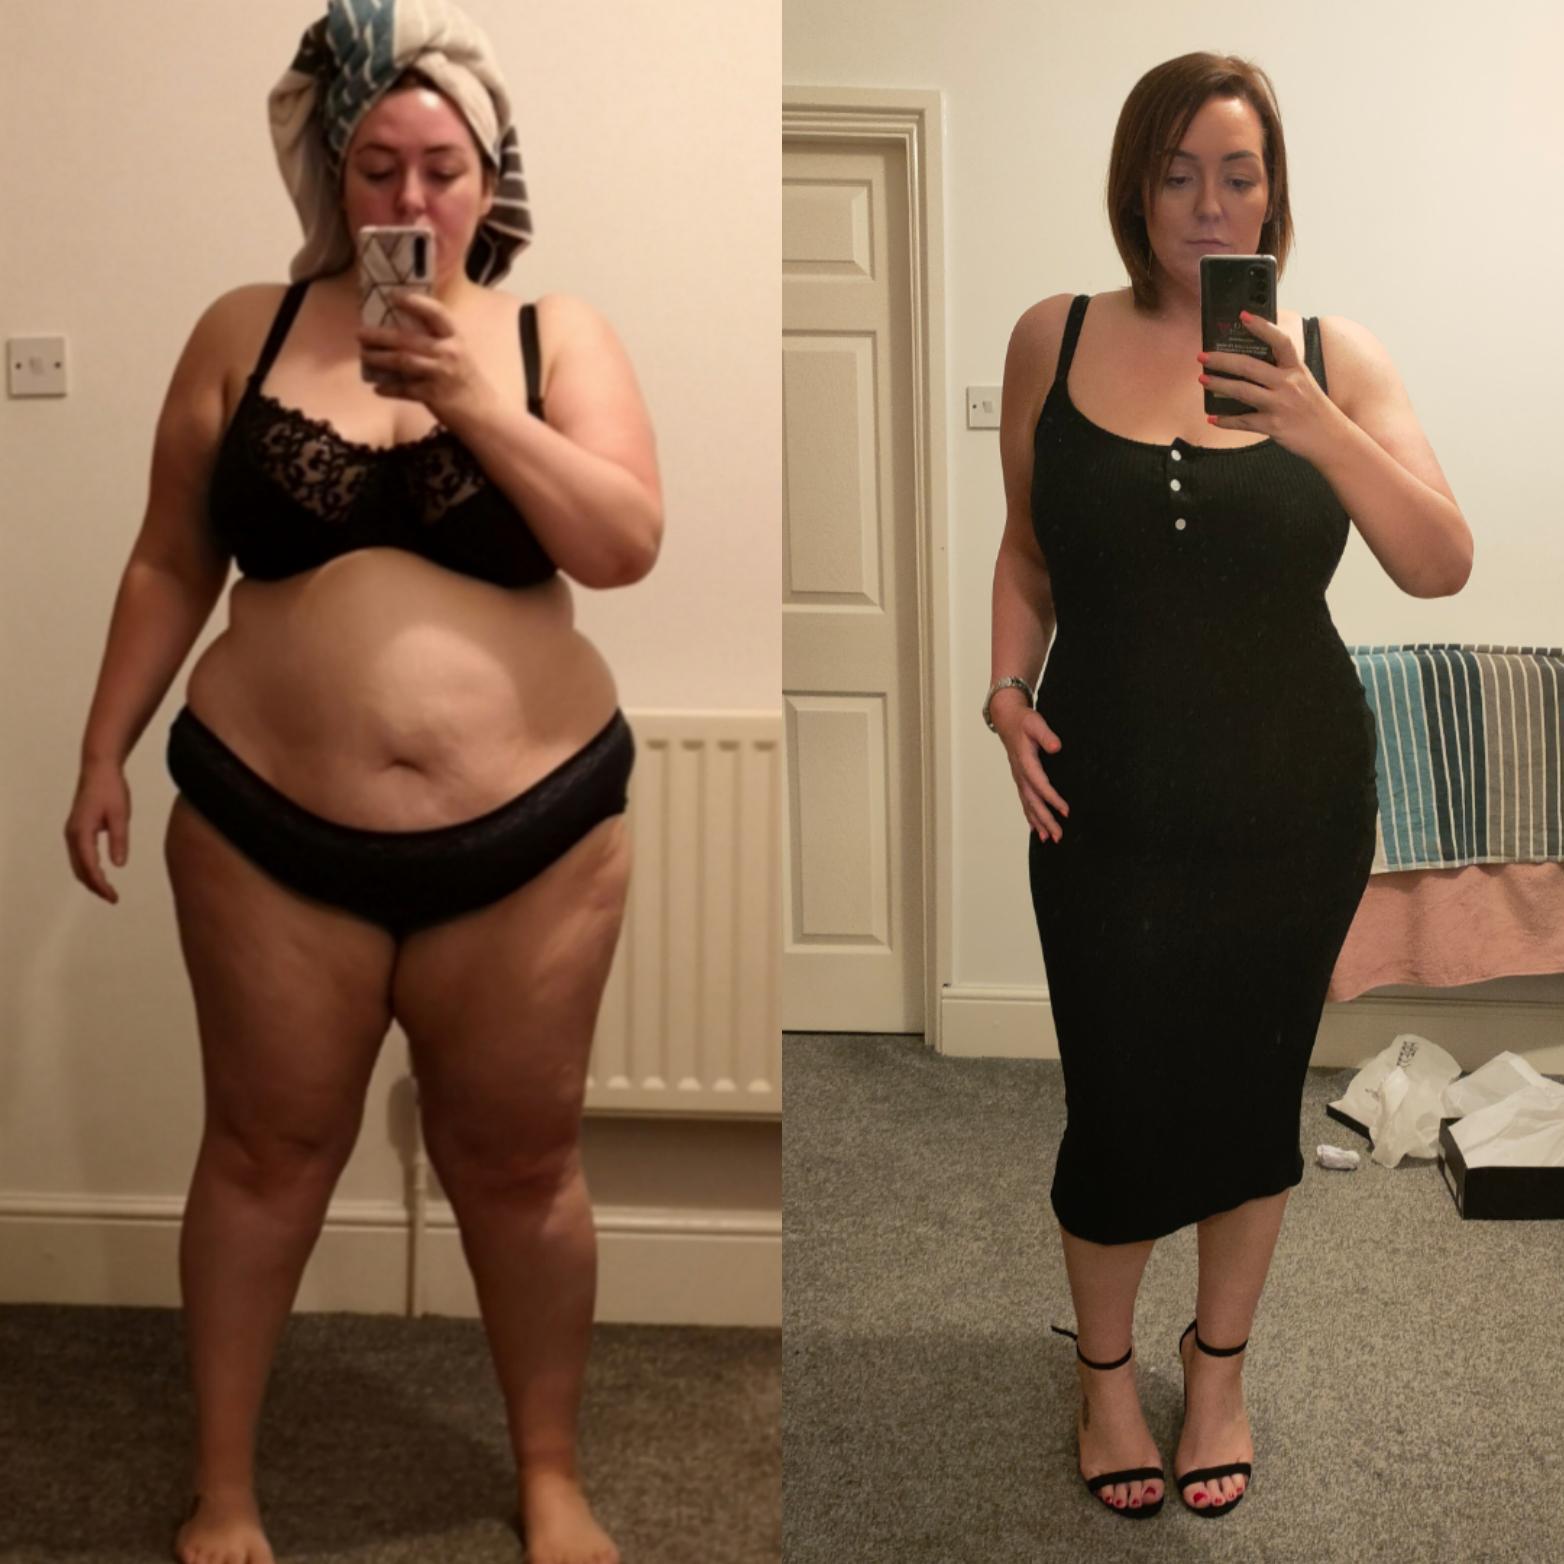 Progress Pics of 88 lbs Weight Loss 5 feet 4 Female 300 lbs to 212 lbs